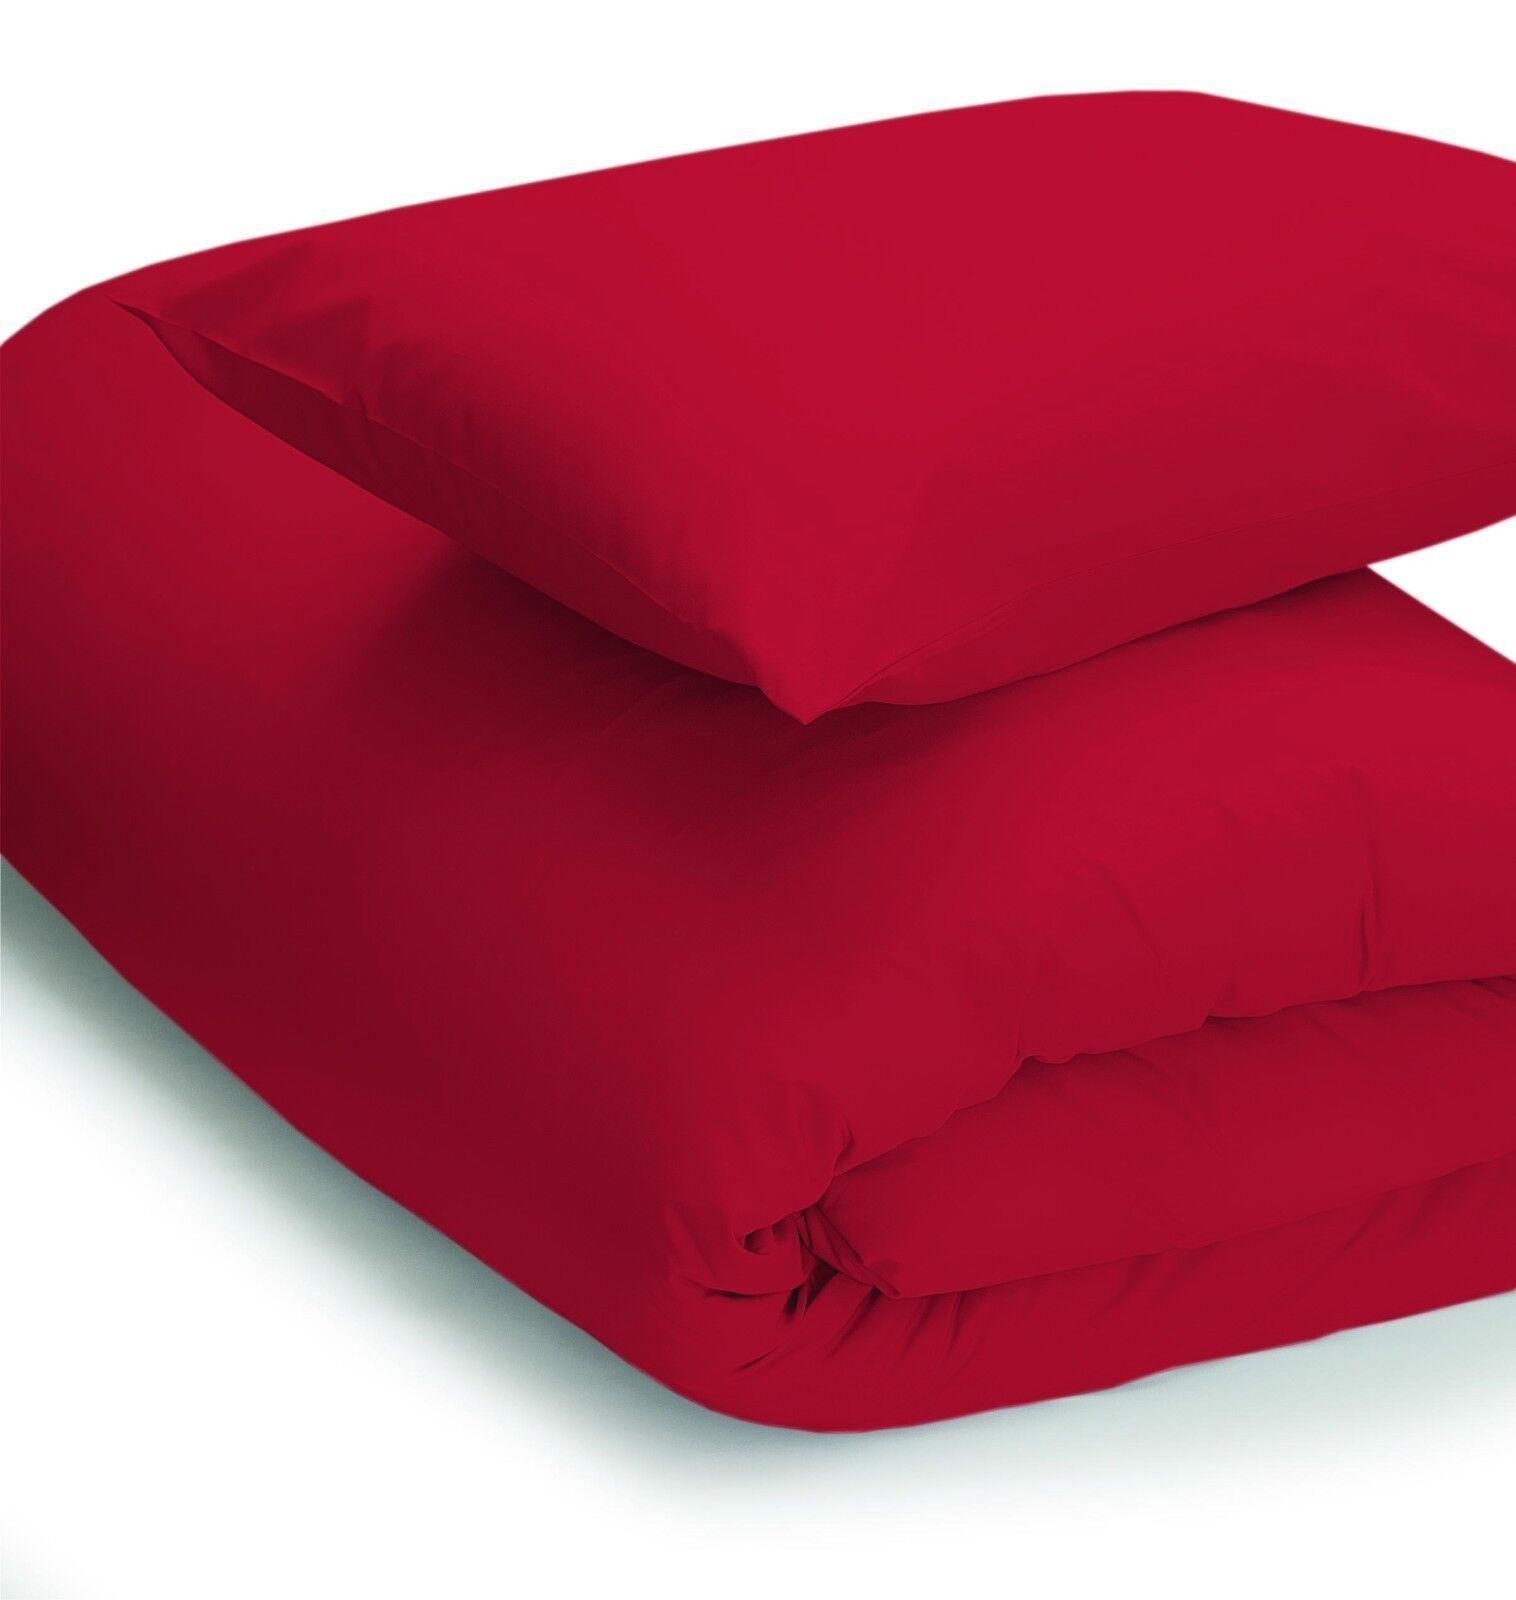 200 Thread Count Polycotton Polycotton Polycotton Duvet Cover Set King Bed Größe in rot 229cm x 218cm 143bd8